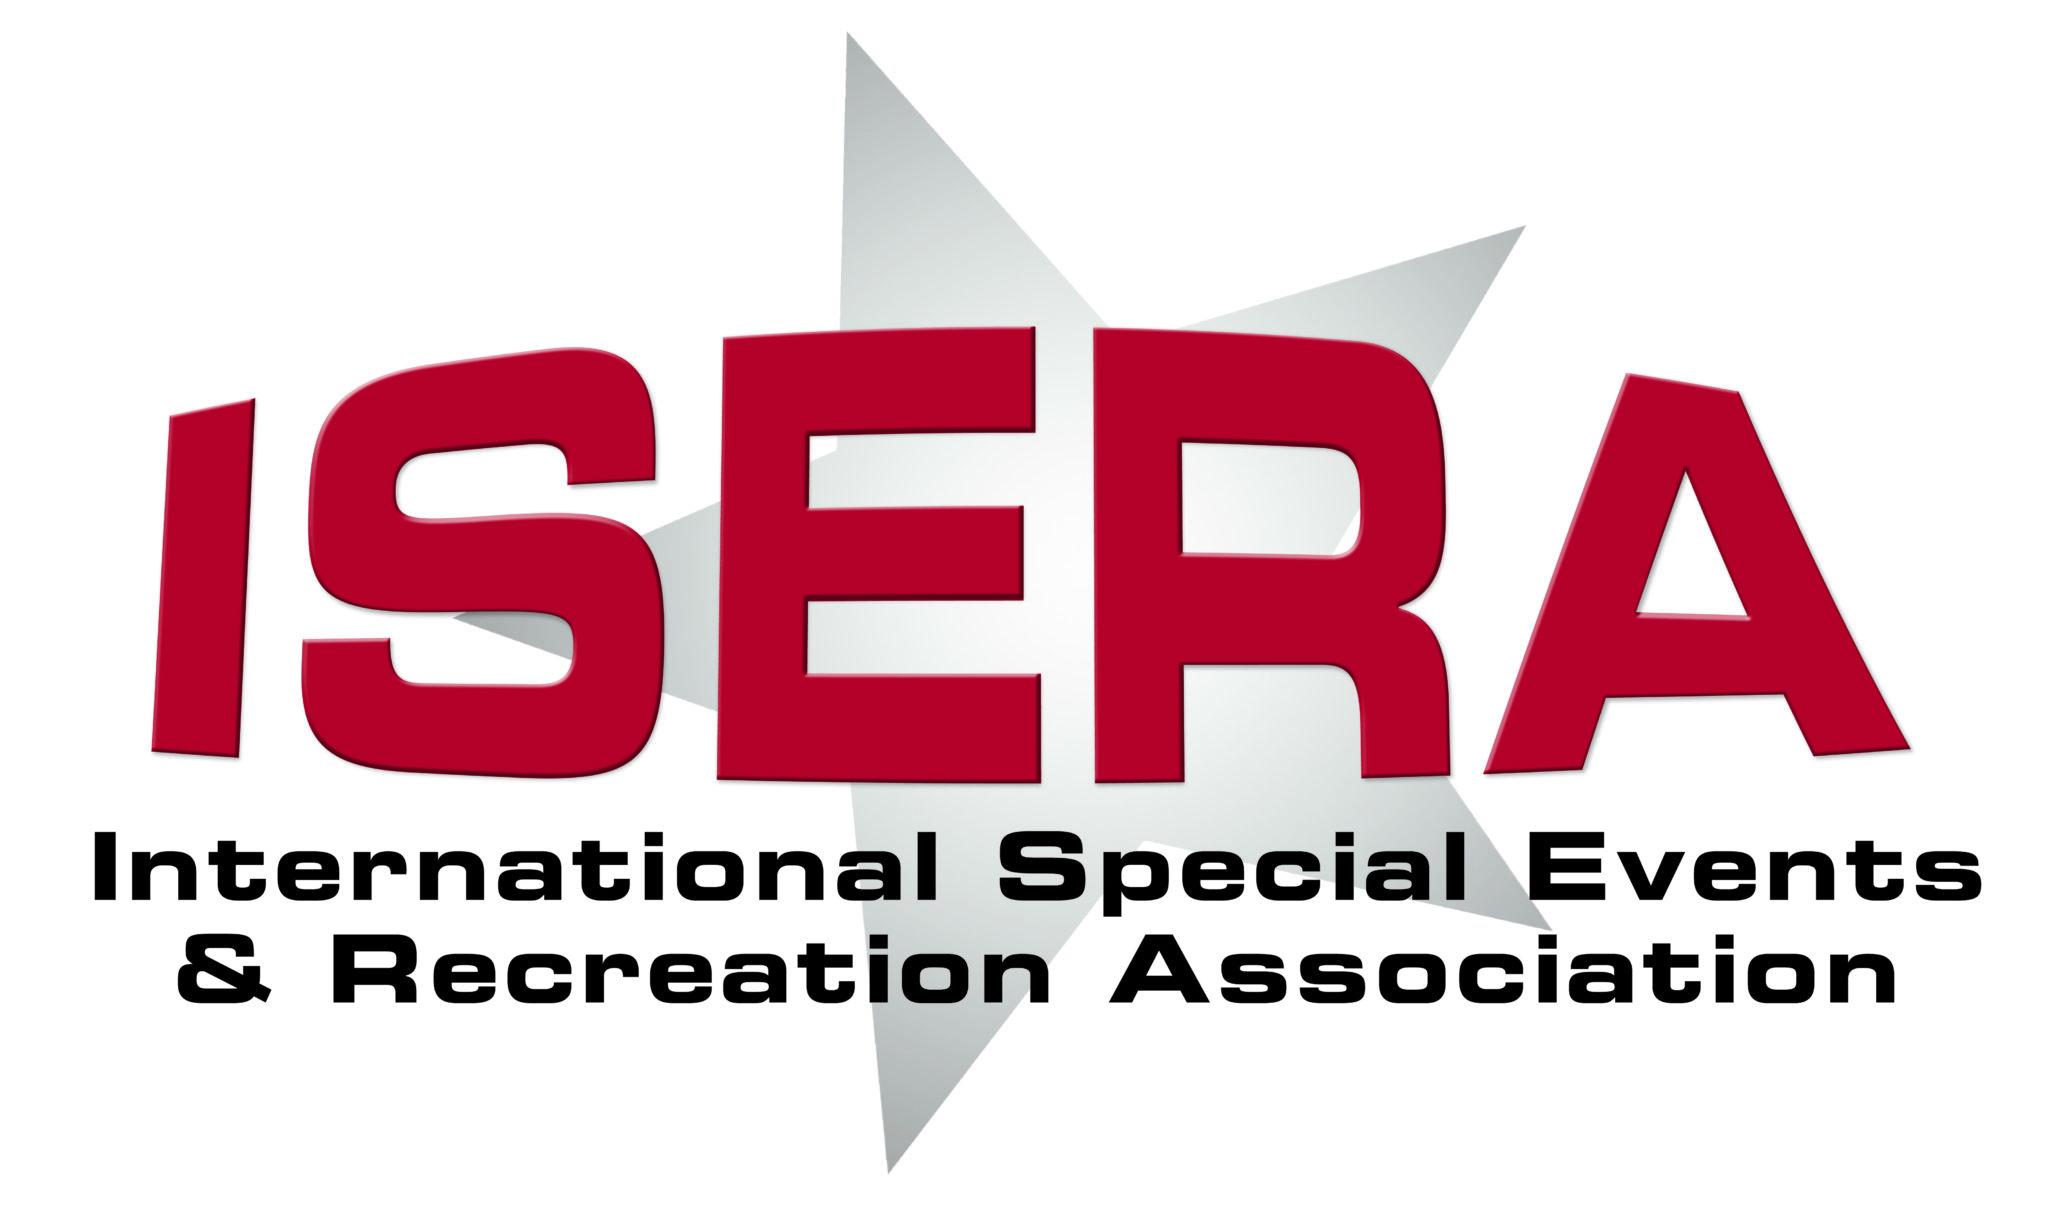 The International Special Events & Recreation Association (ISERA)